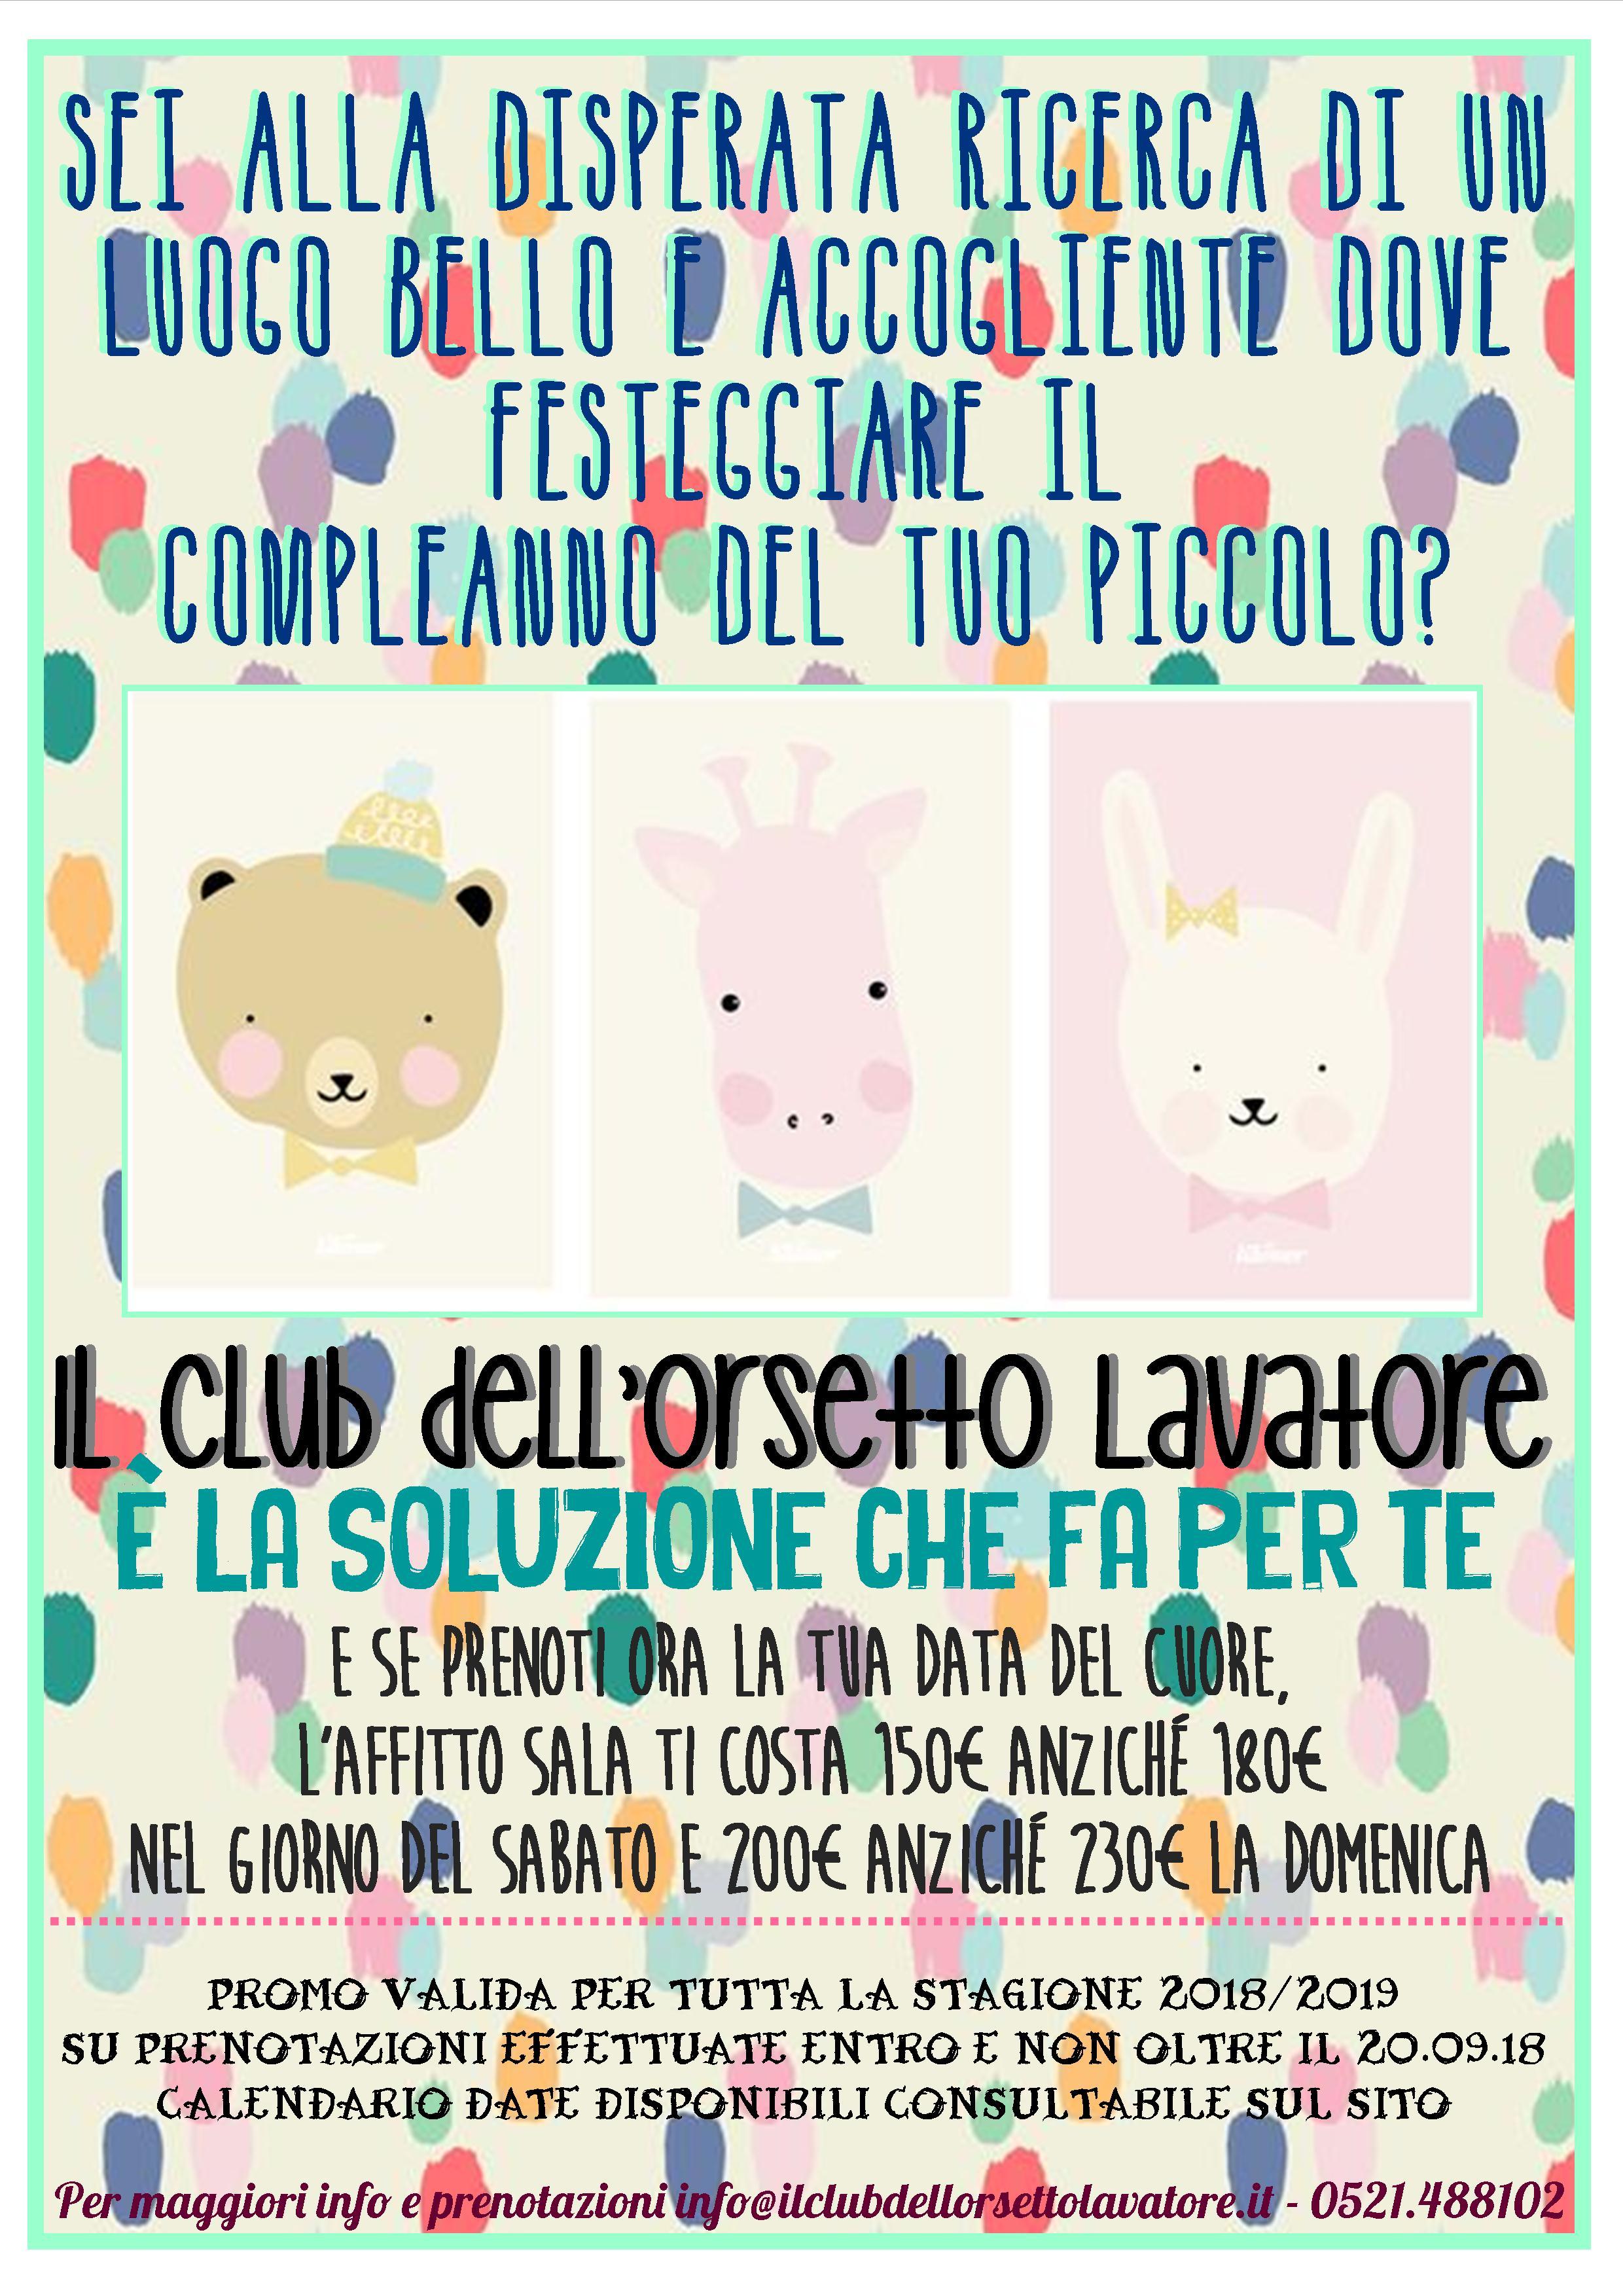 promo_affitto_sala